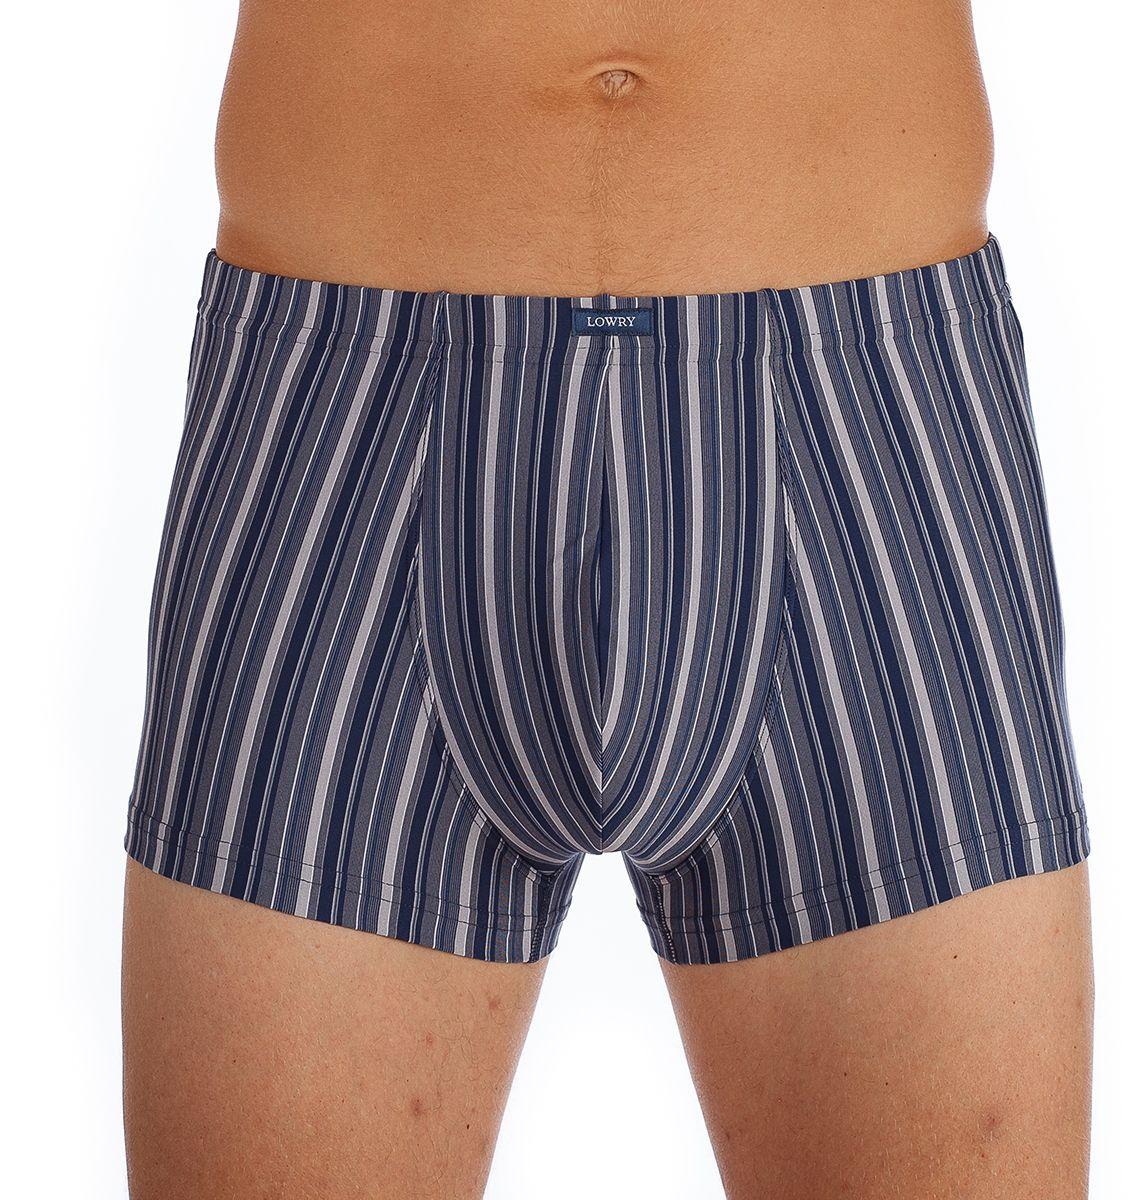 Трусы-боксеры мужские Lowry, цвет: синий, серый. MSHL-403. Размер L (48) трусы lowry трусы 3 шт